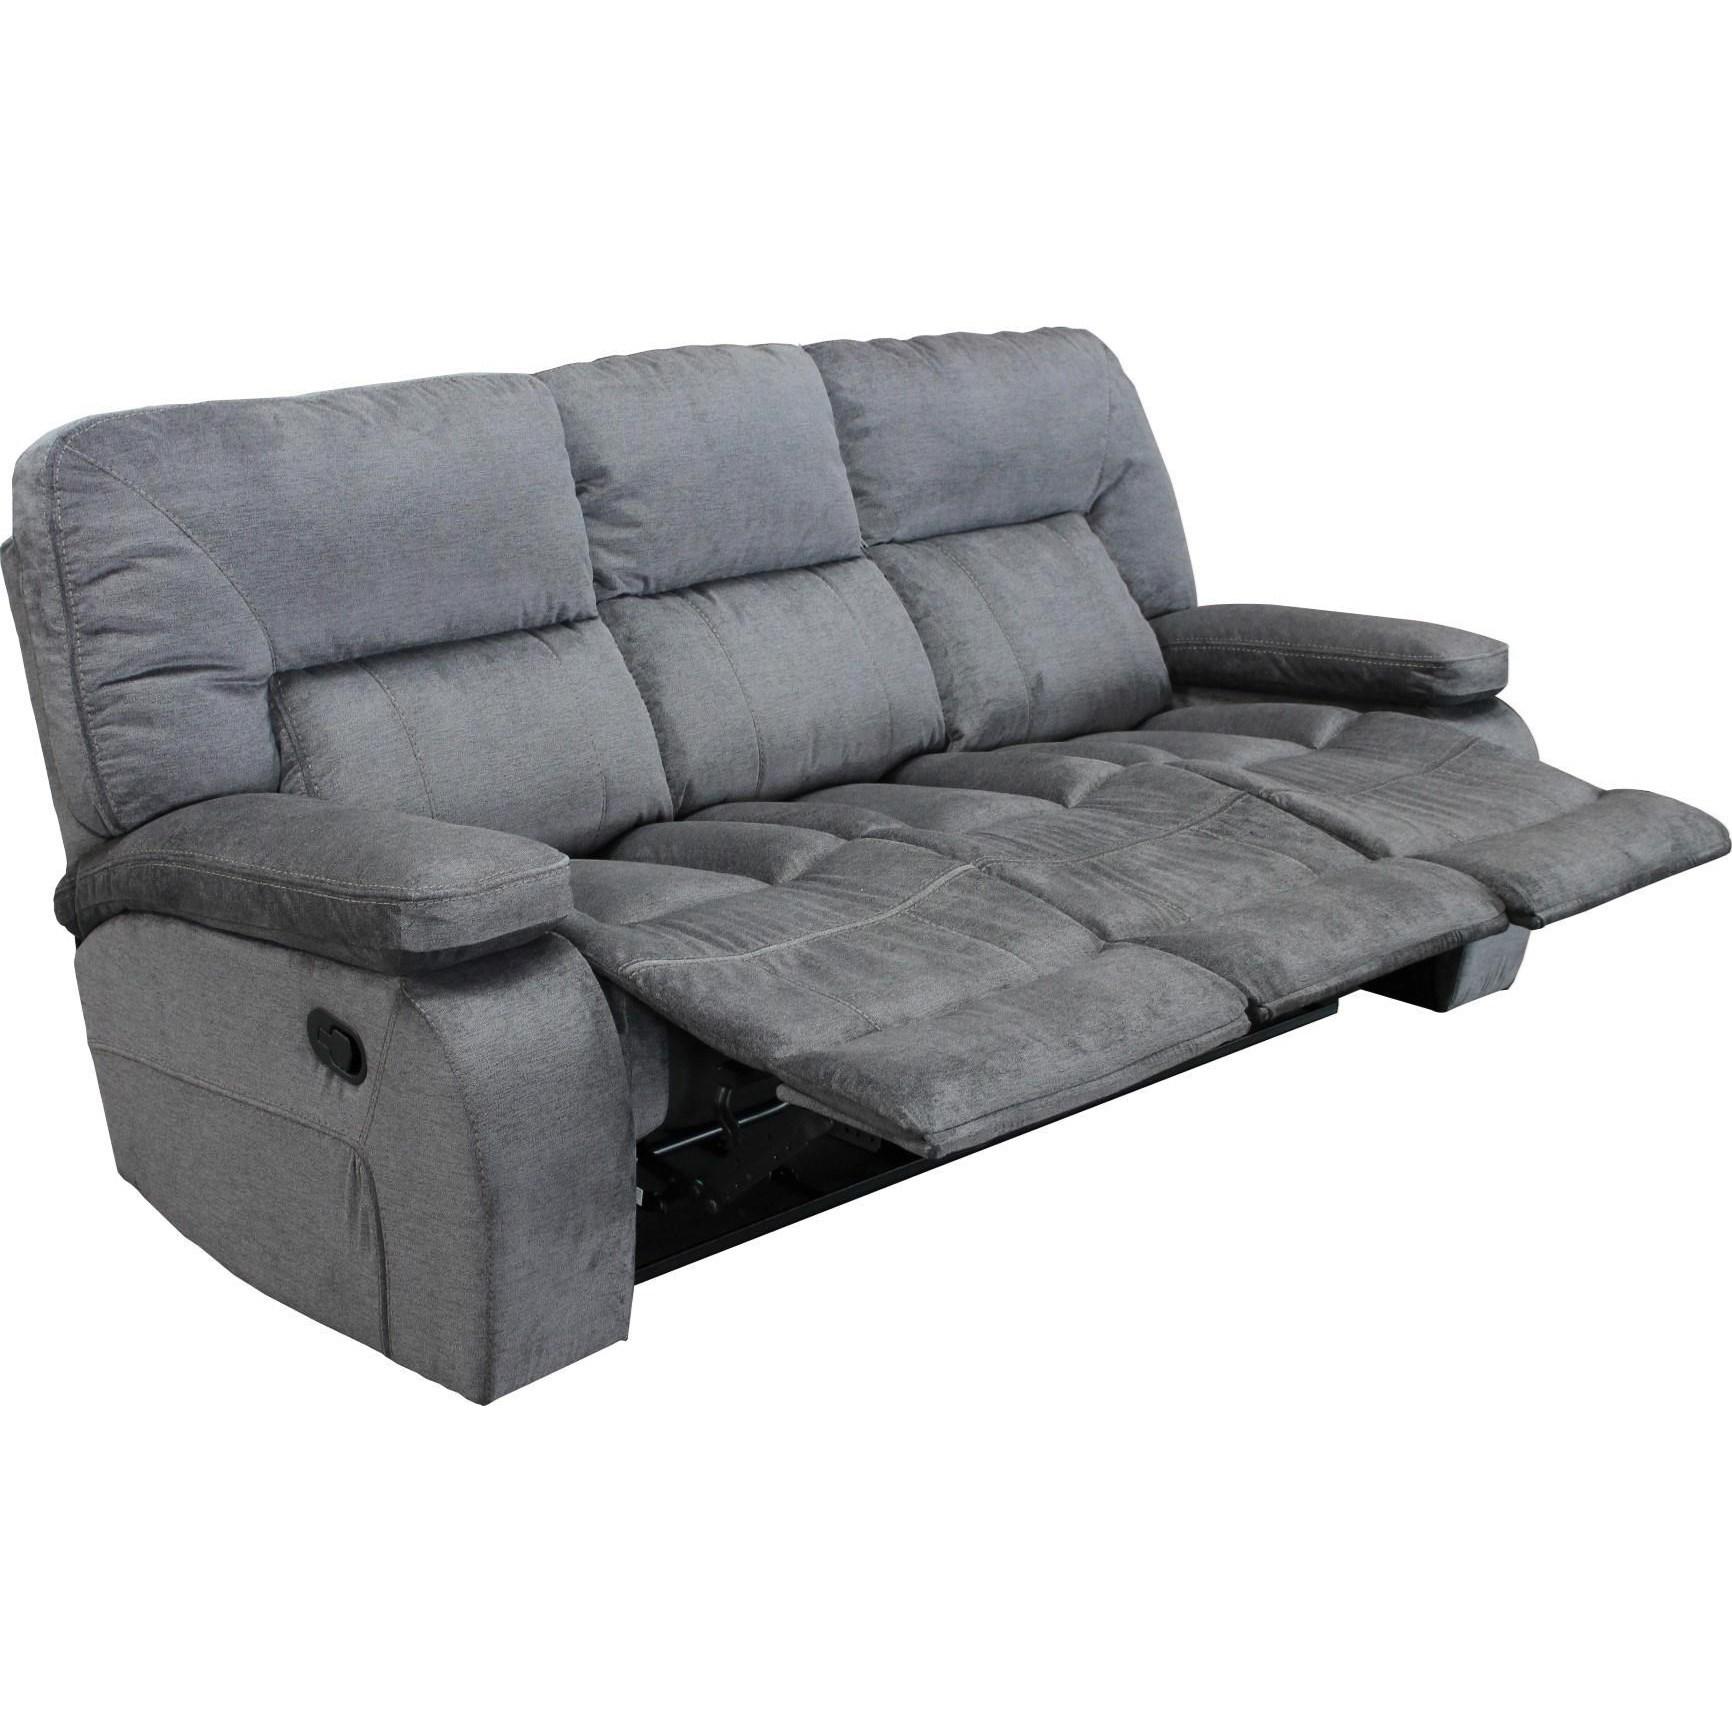 lane triple reclining sofa ralph lauren sectional parker living chapman mcha 833 pol casual